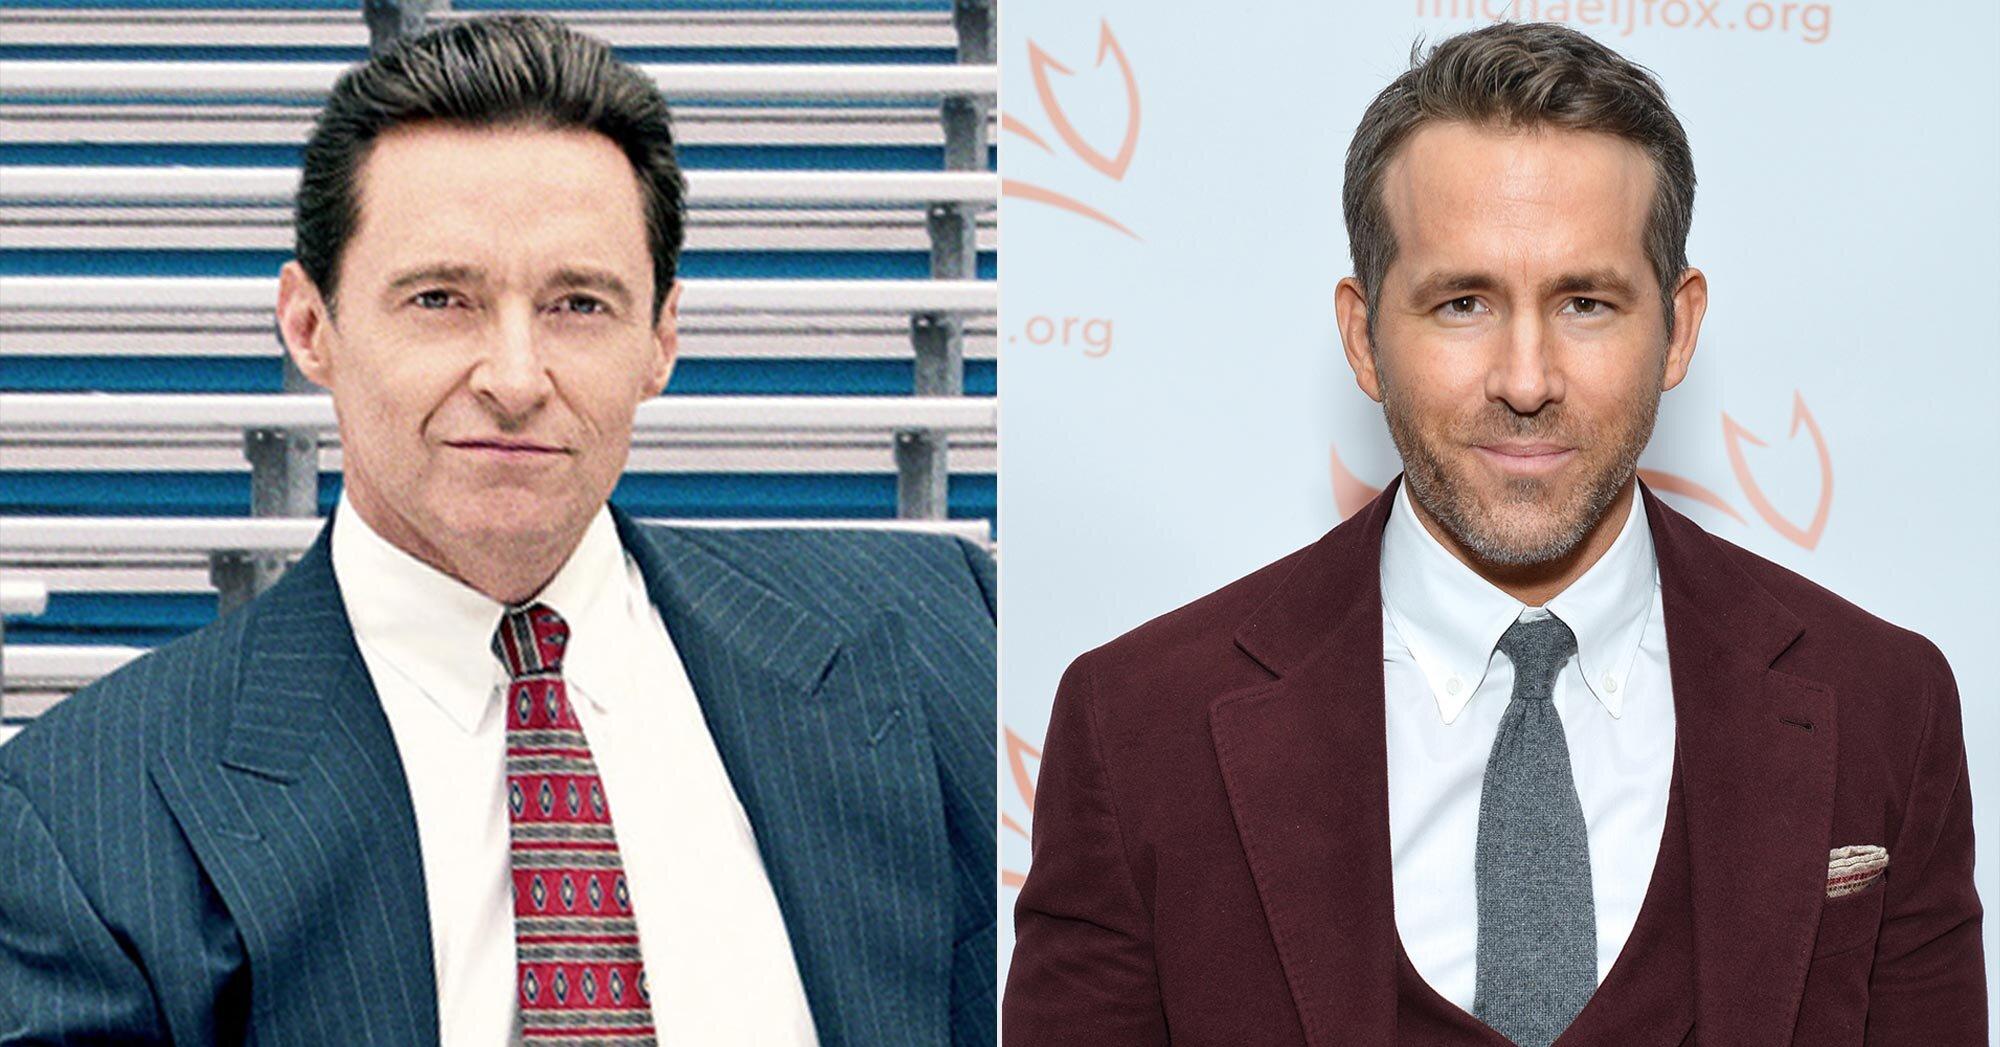 Hugh Jackman responds to Emmy nomination with Ryan Reynolds zingers